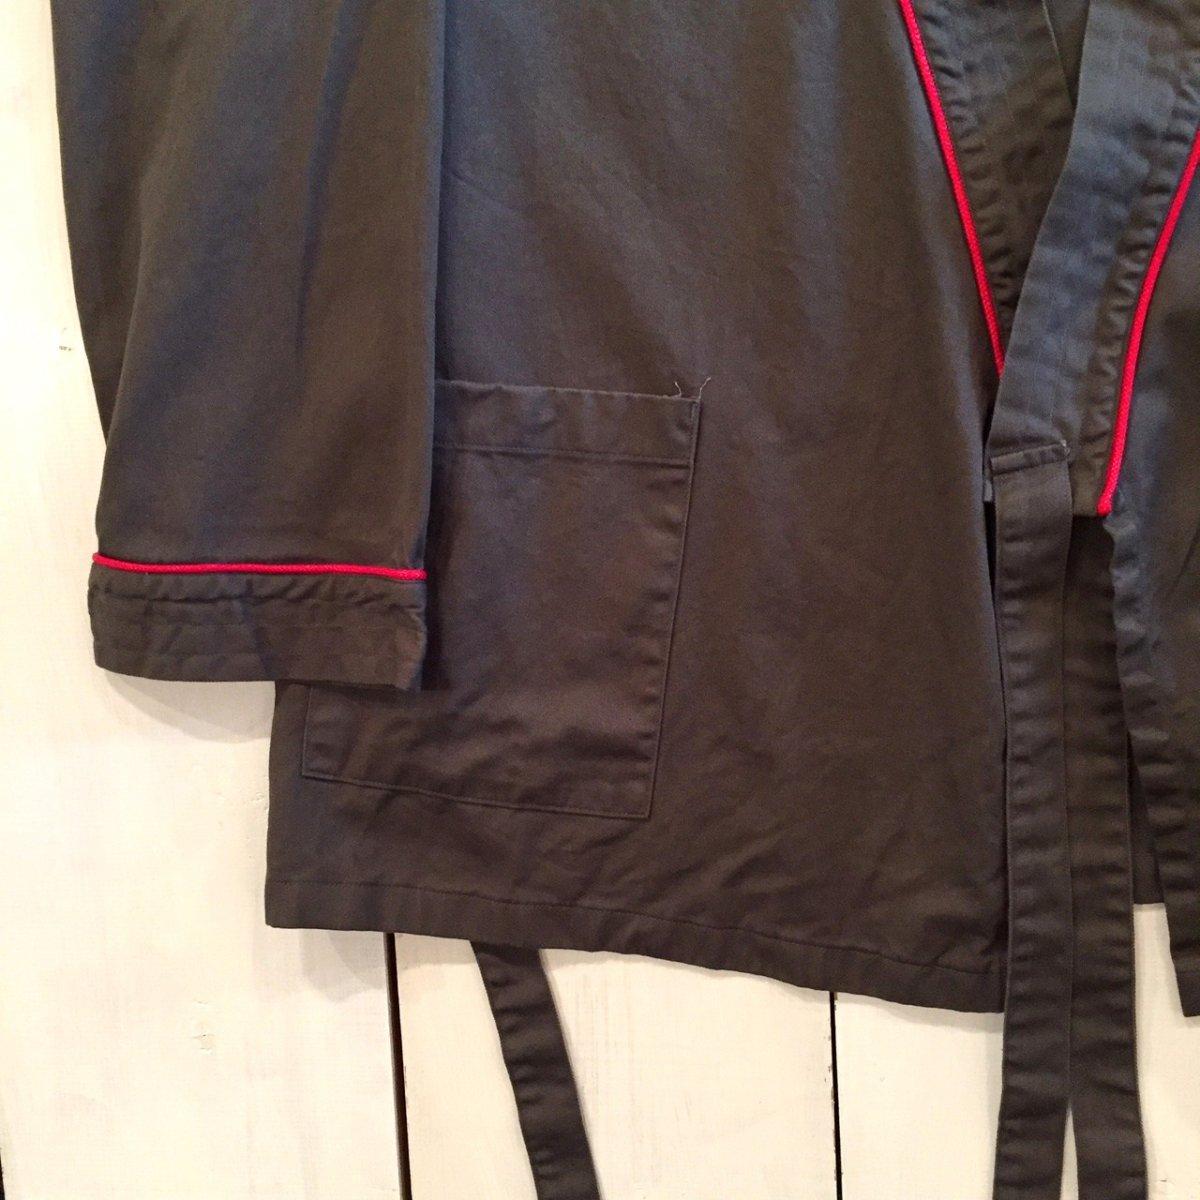 <img class='new_mark_img1' src='https://img.shop-pro.jp/img/new/icons3.gif' style='border:none;display:inline;margin:0px;padding:0px;width:auto;' />Black weirdos  ブラック ウィドー / ジャケット DO-GI (Martial Arts Uniform) Shirt 【OLIVE】